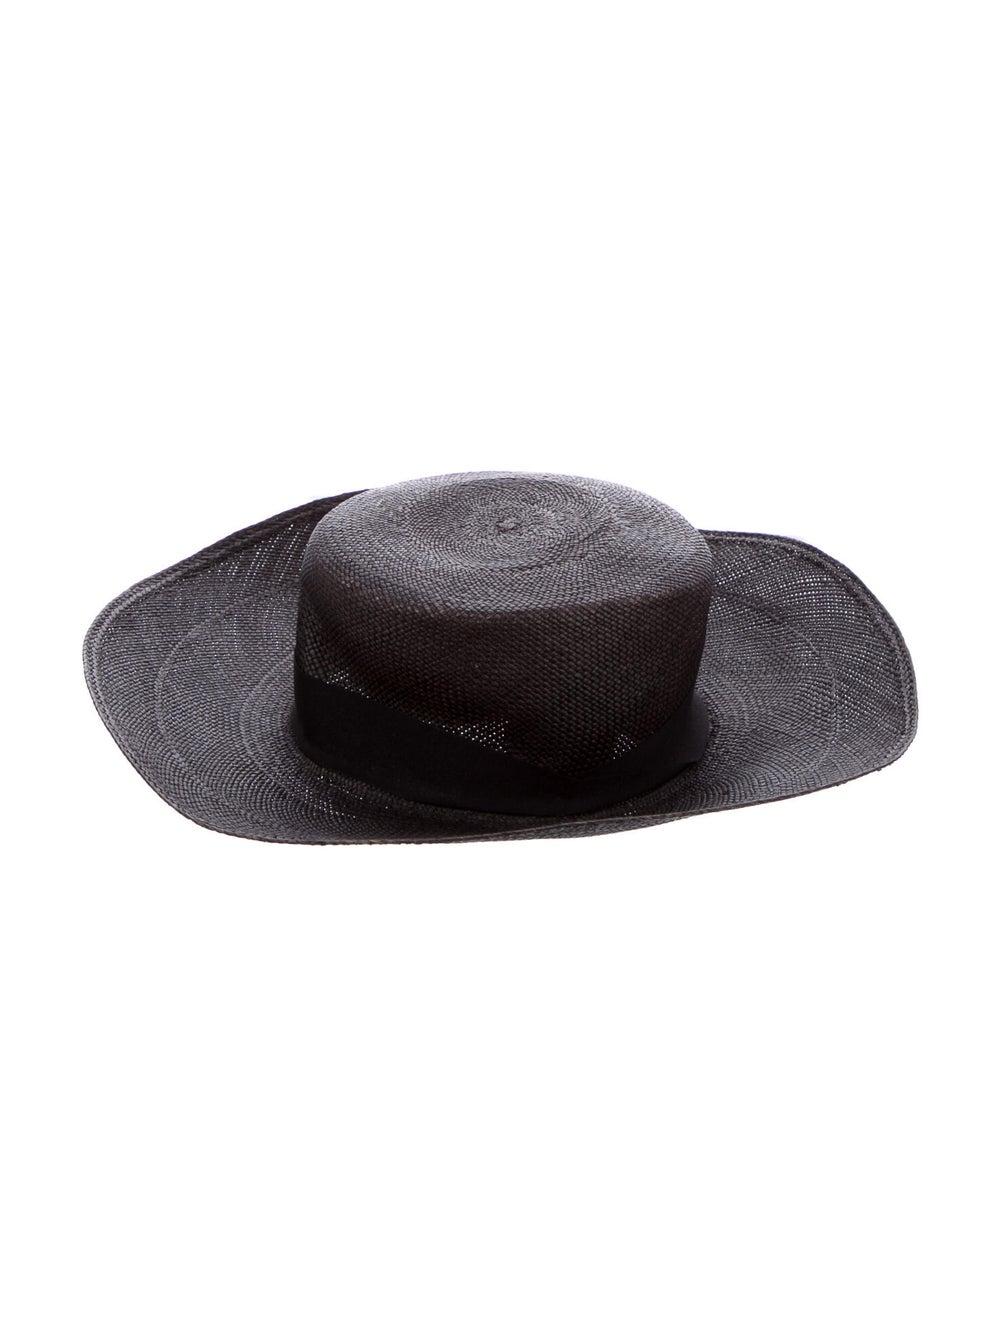 Sensi Studio Straw Wide Brim Hat Black - image 2